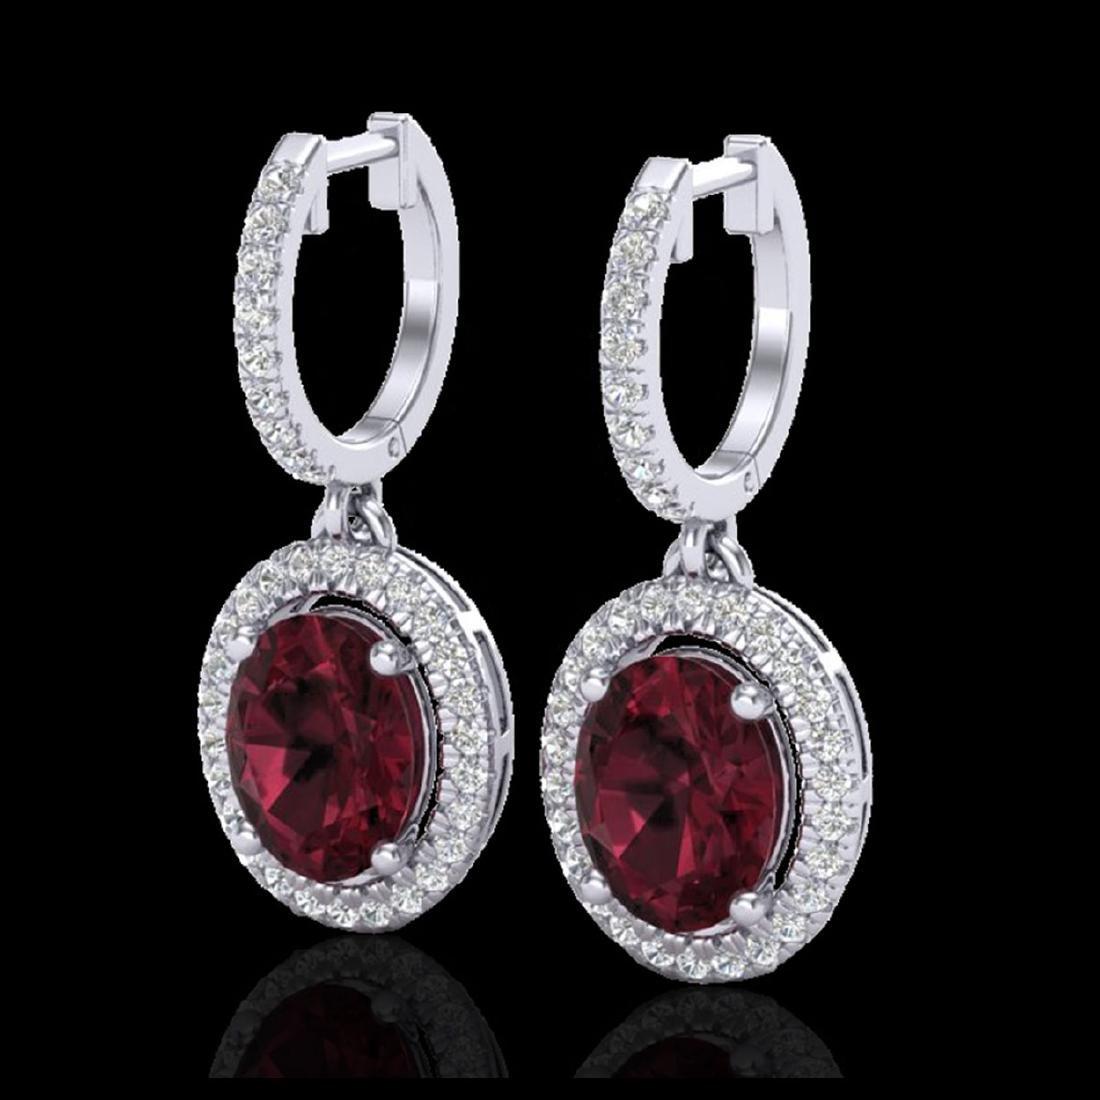 3.75 CTW Garnet & Micro Pave VS/SI Diamond Earrings